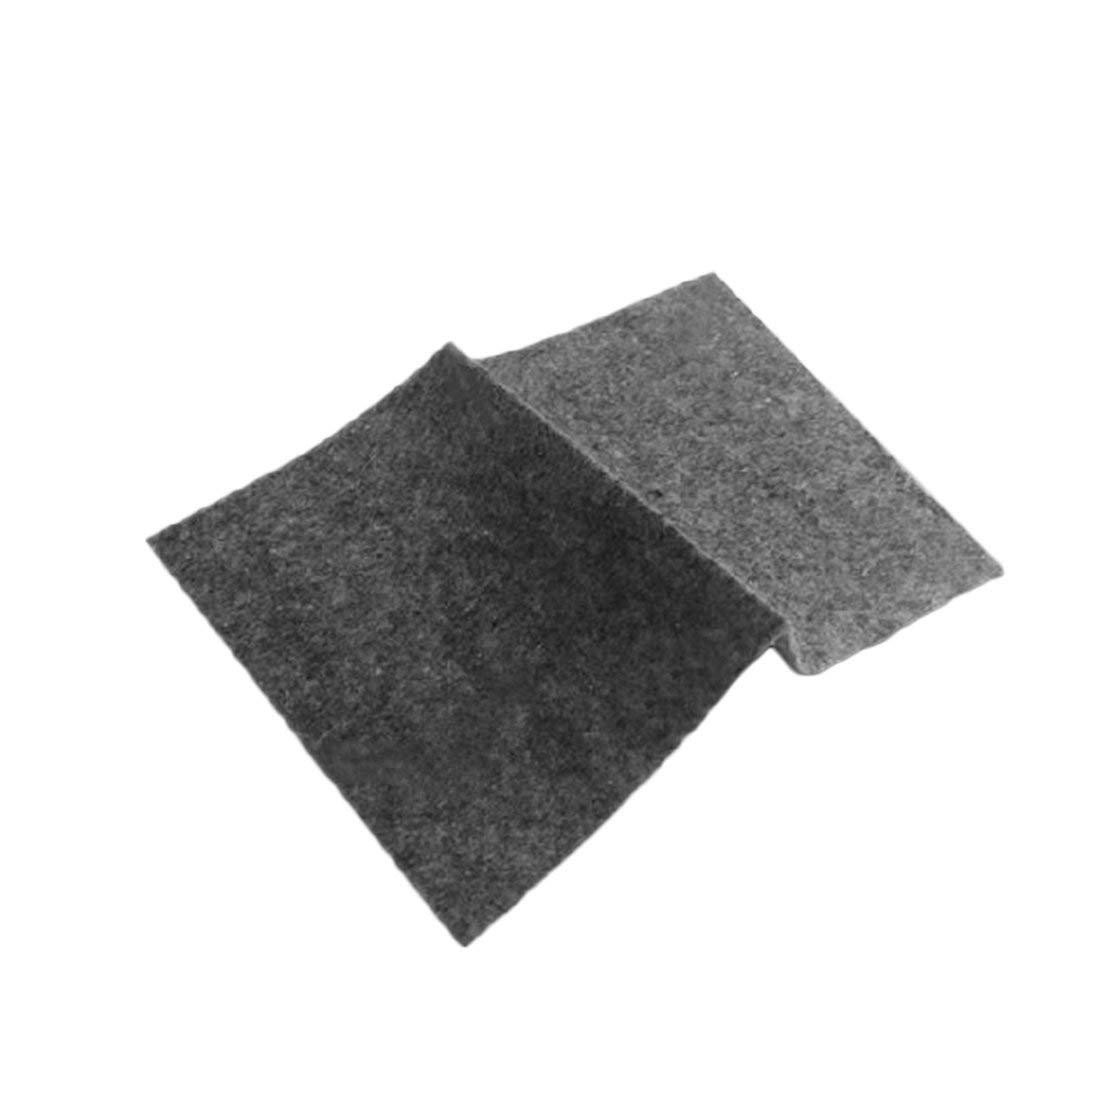 BlackPJenny Universal Car Remove Scratches Eraser Clear Coat Fast Fix Magical Cloth Scratches Riparazione Panno Auto Riparazione Rags